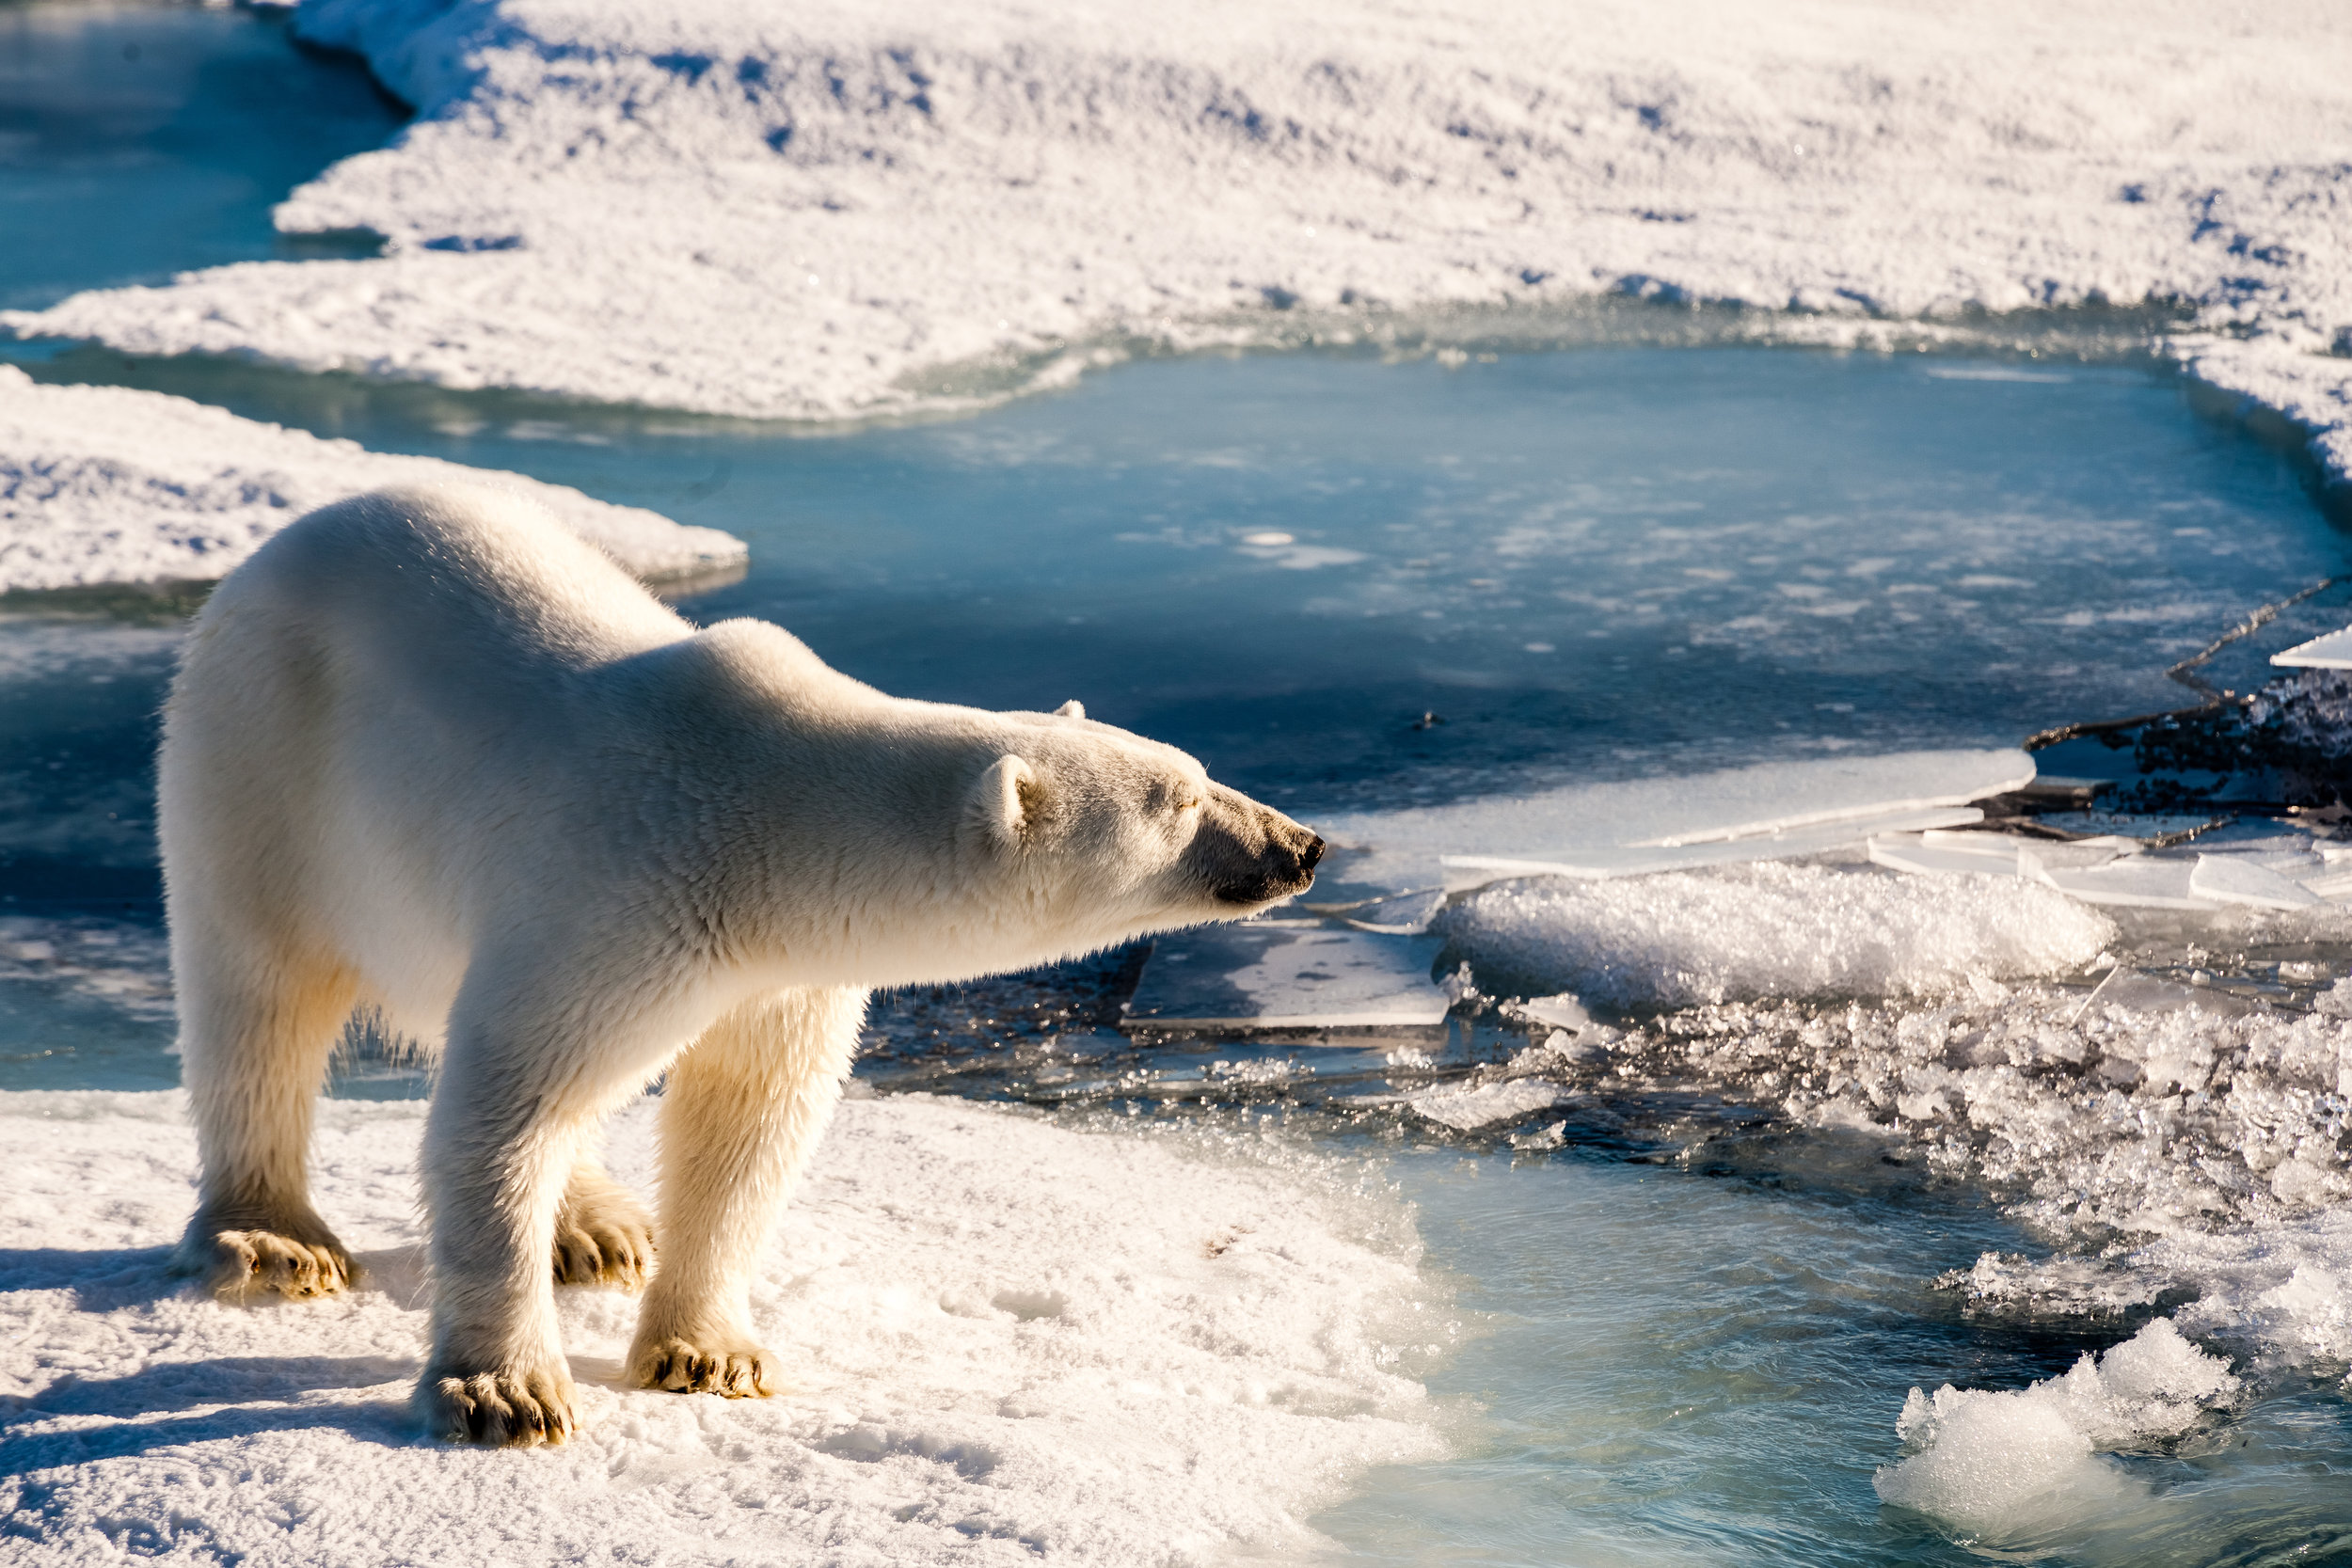 Sightings of Polar Bears